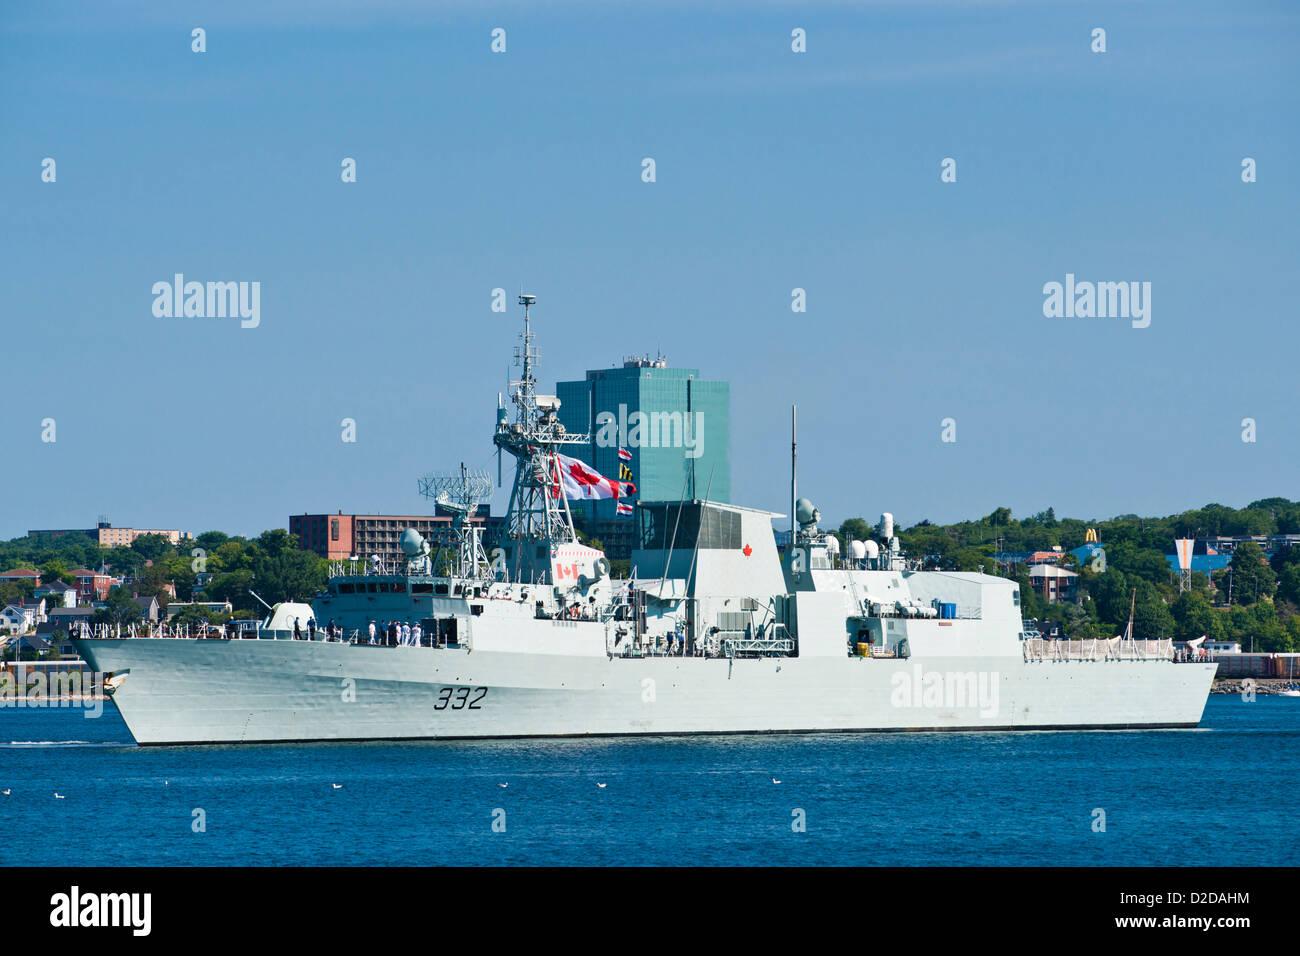 HMCS VILLE DE QUEBEC (FFH 332) in Halifax Harbour, Nova Scotia, Canada. - Stock Image